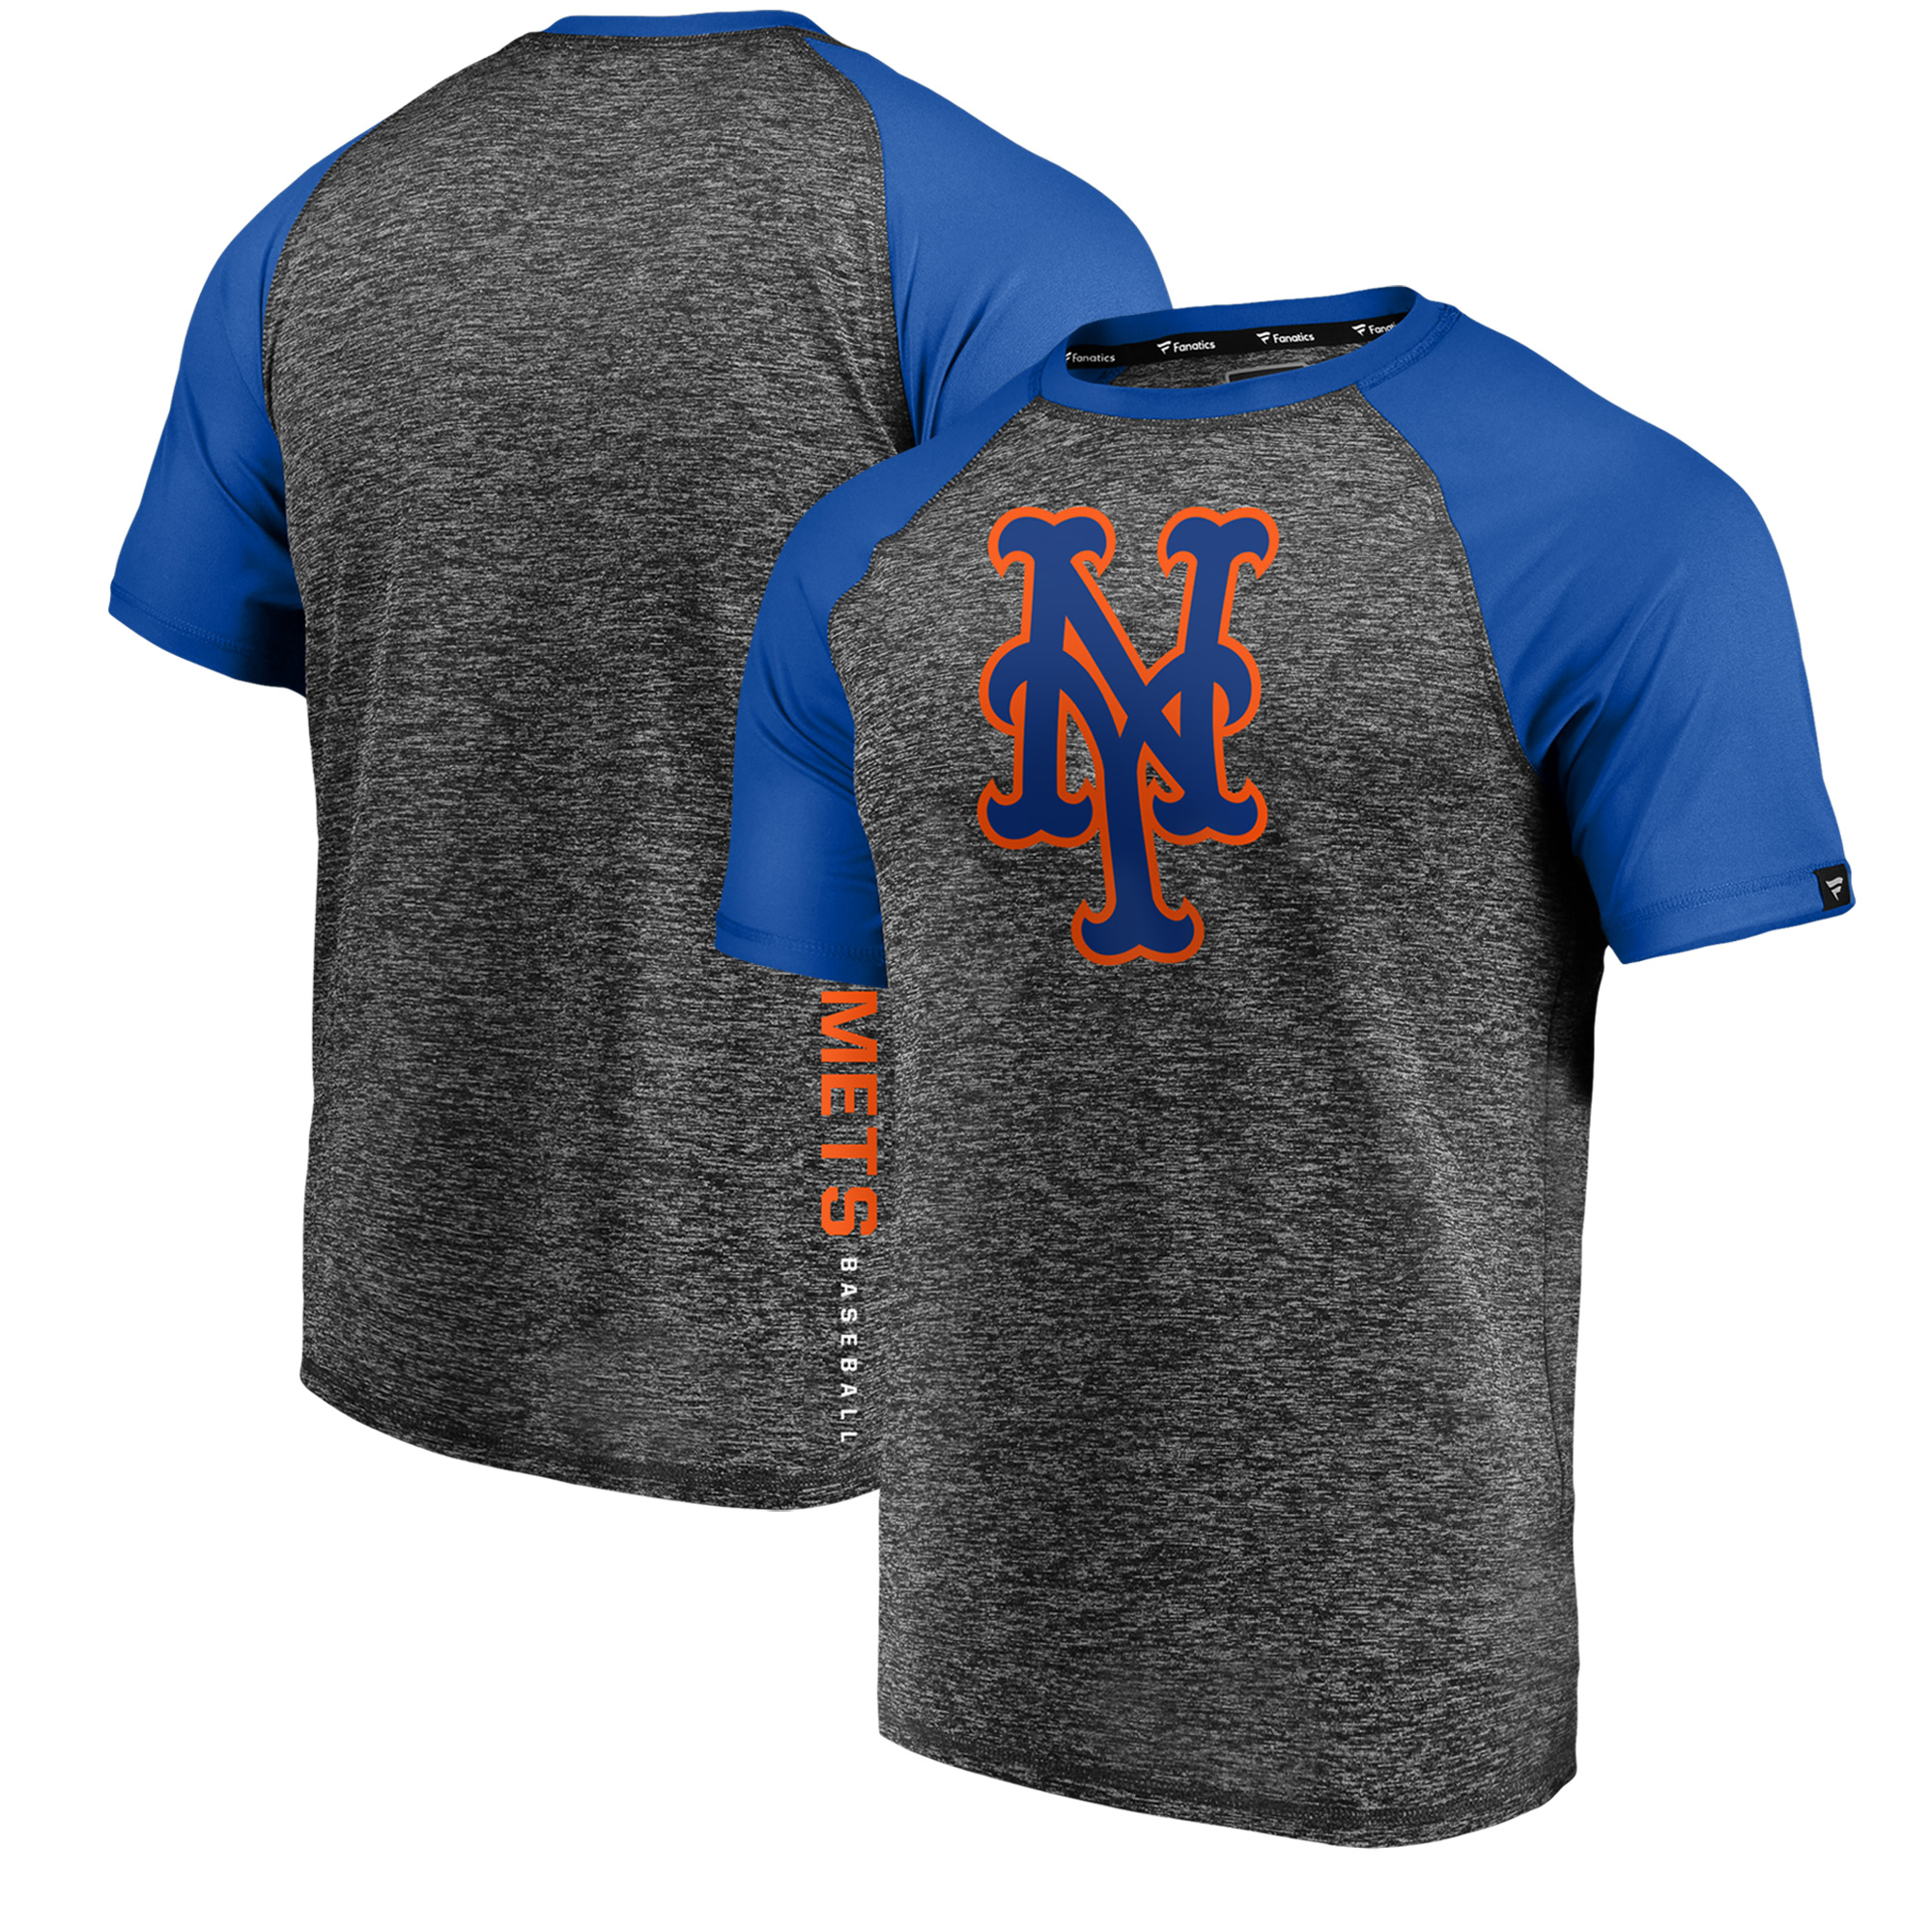 New York Mets Fanatics Branded Static T-Shirt - Charcoal/Royal